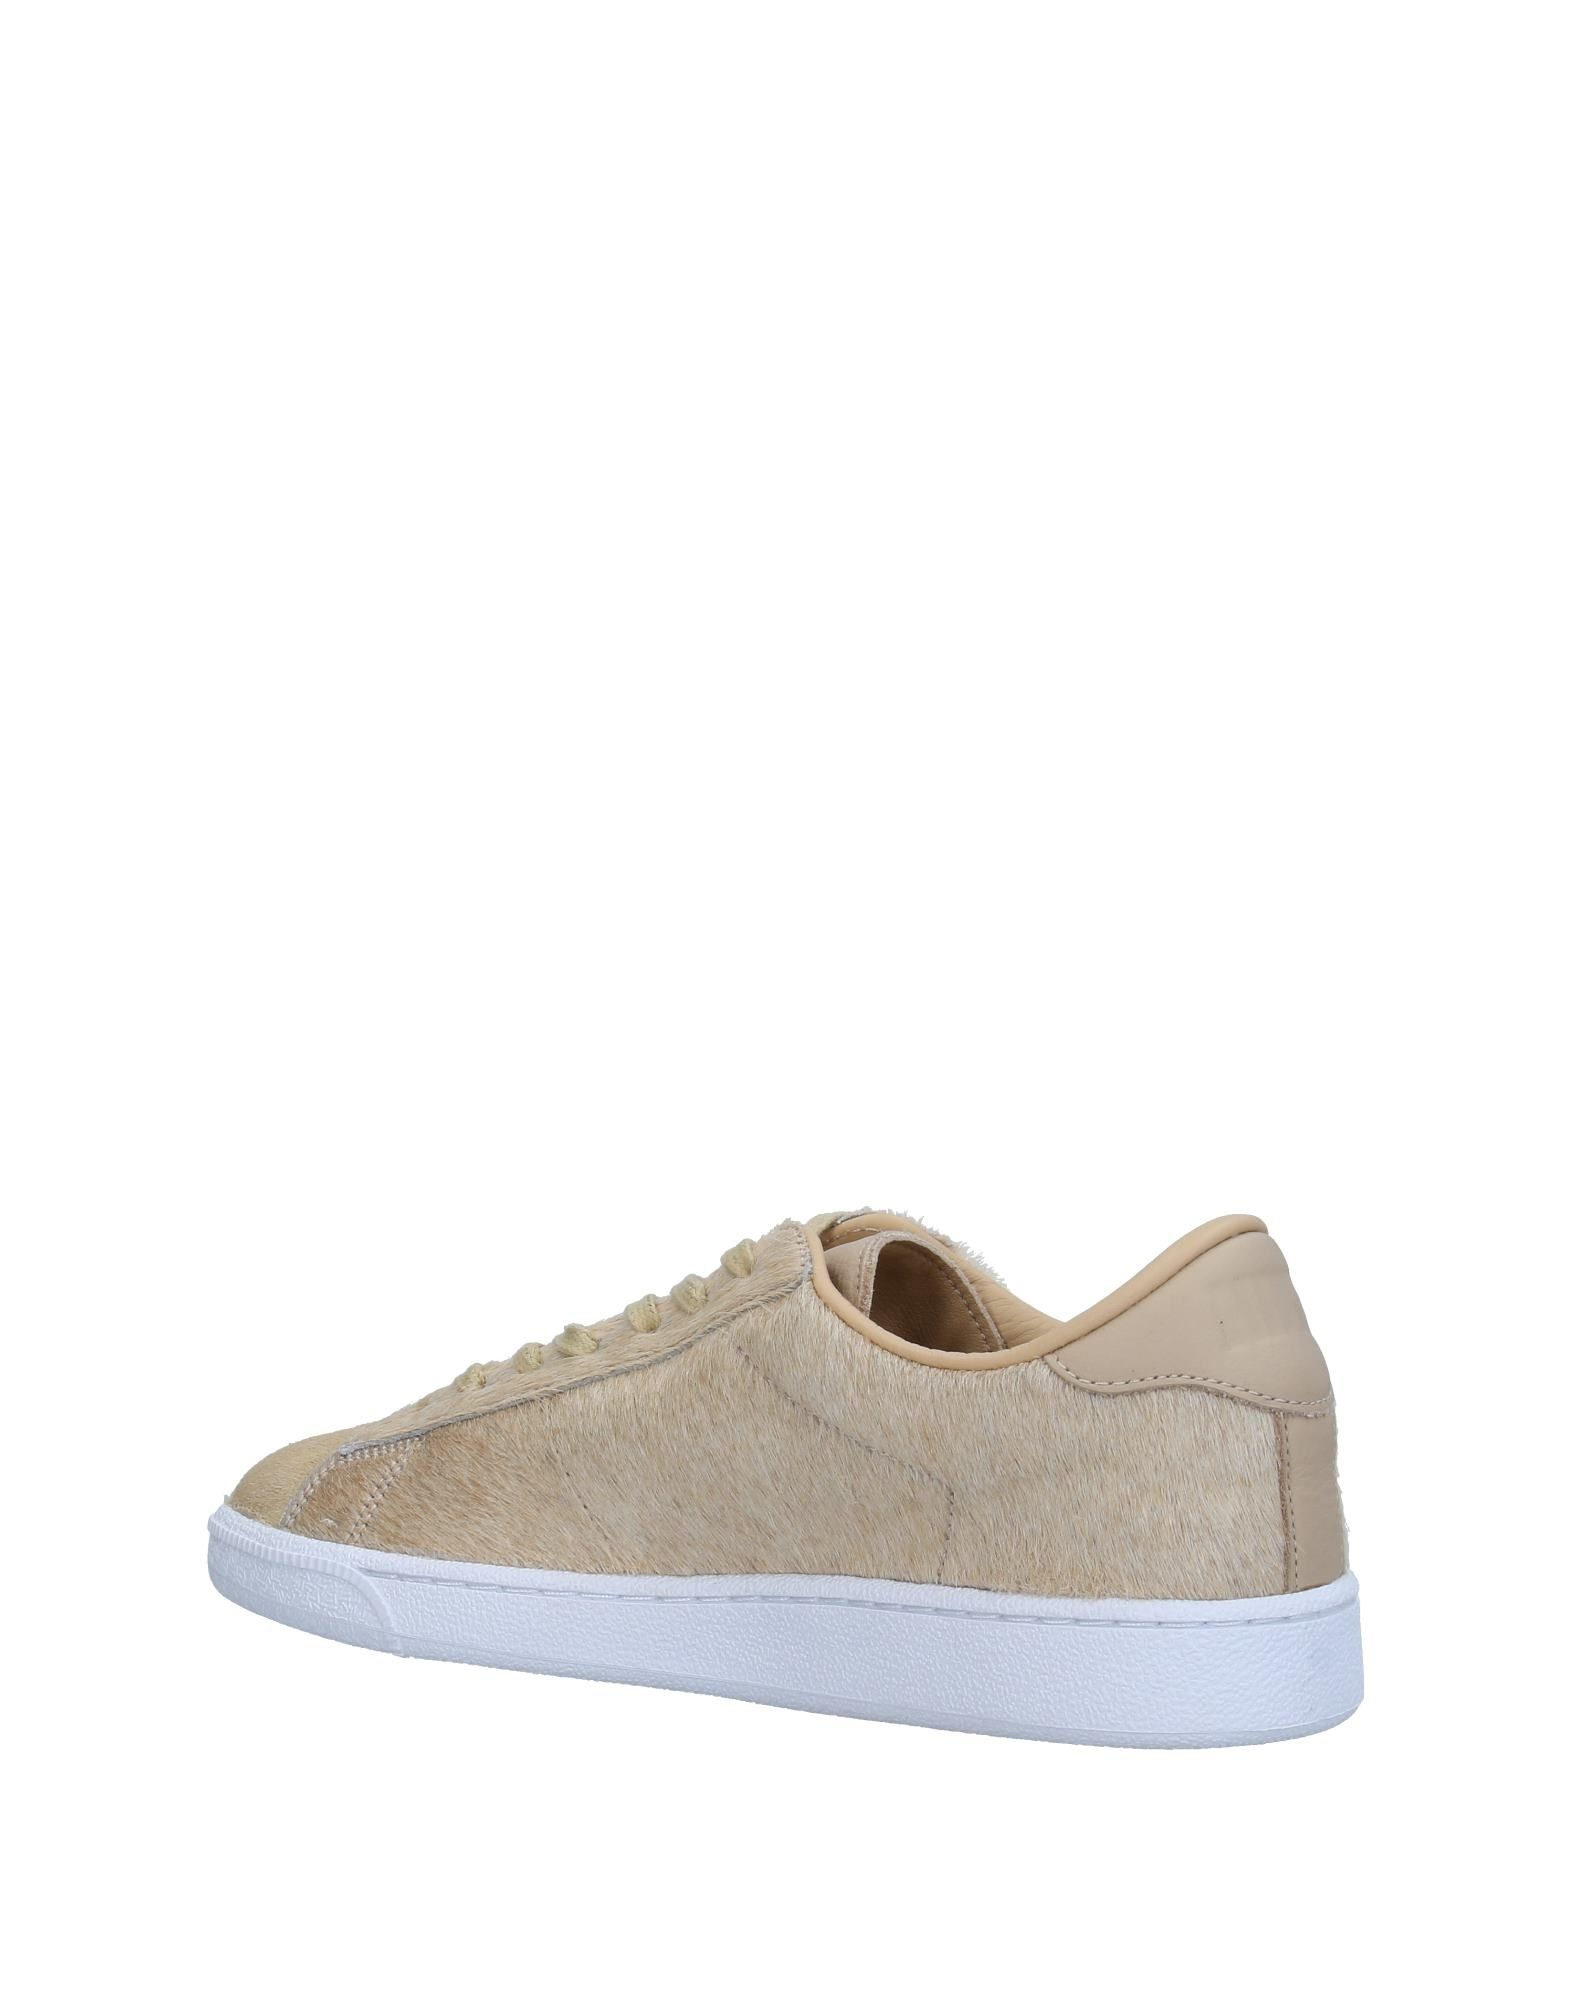 Haltbare Mode billige Schuhe Nike Sneakers Herren  11335732SV Heiße Schuhe